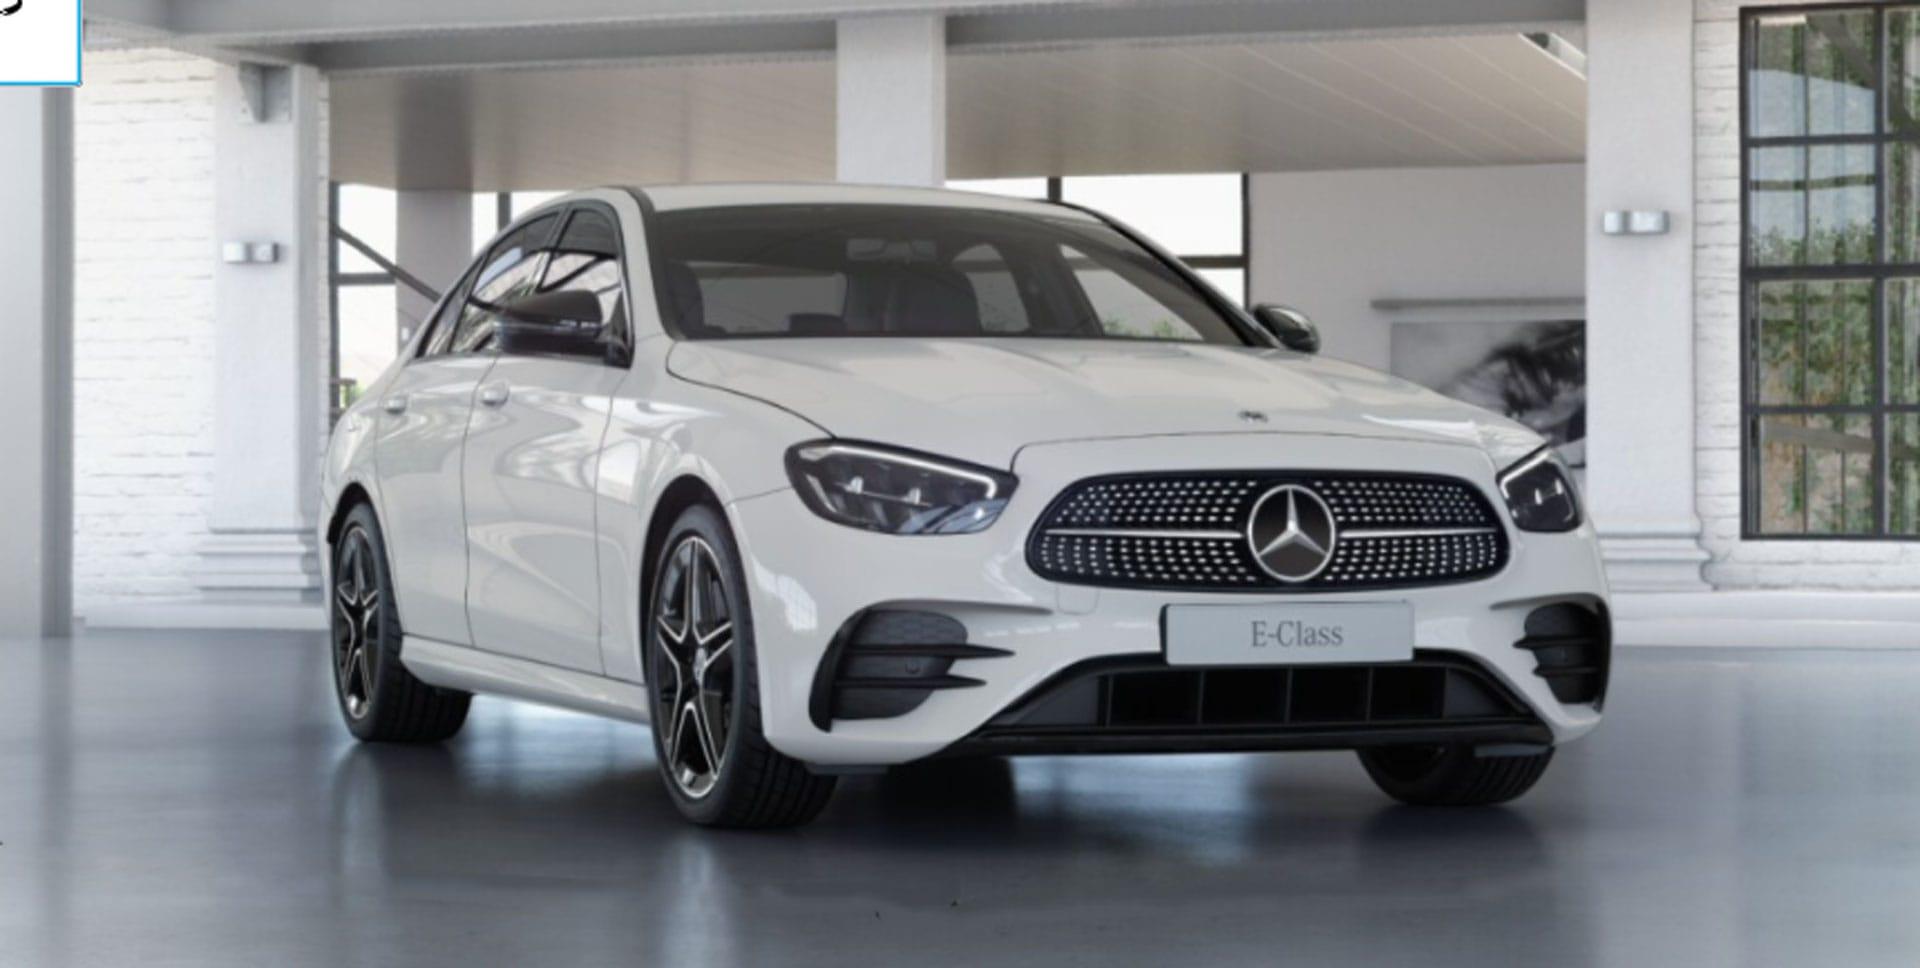 Mercedes-Benz E-Class Limousine 0152623132